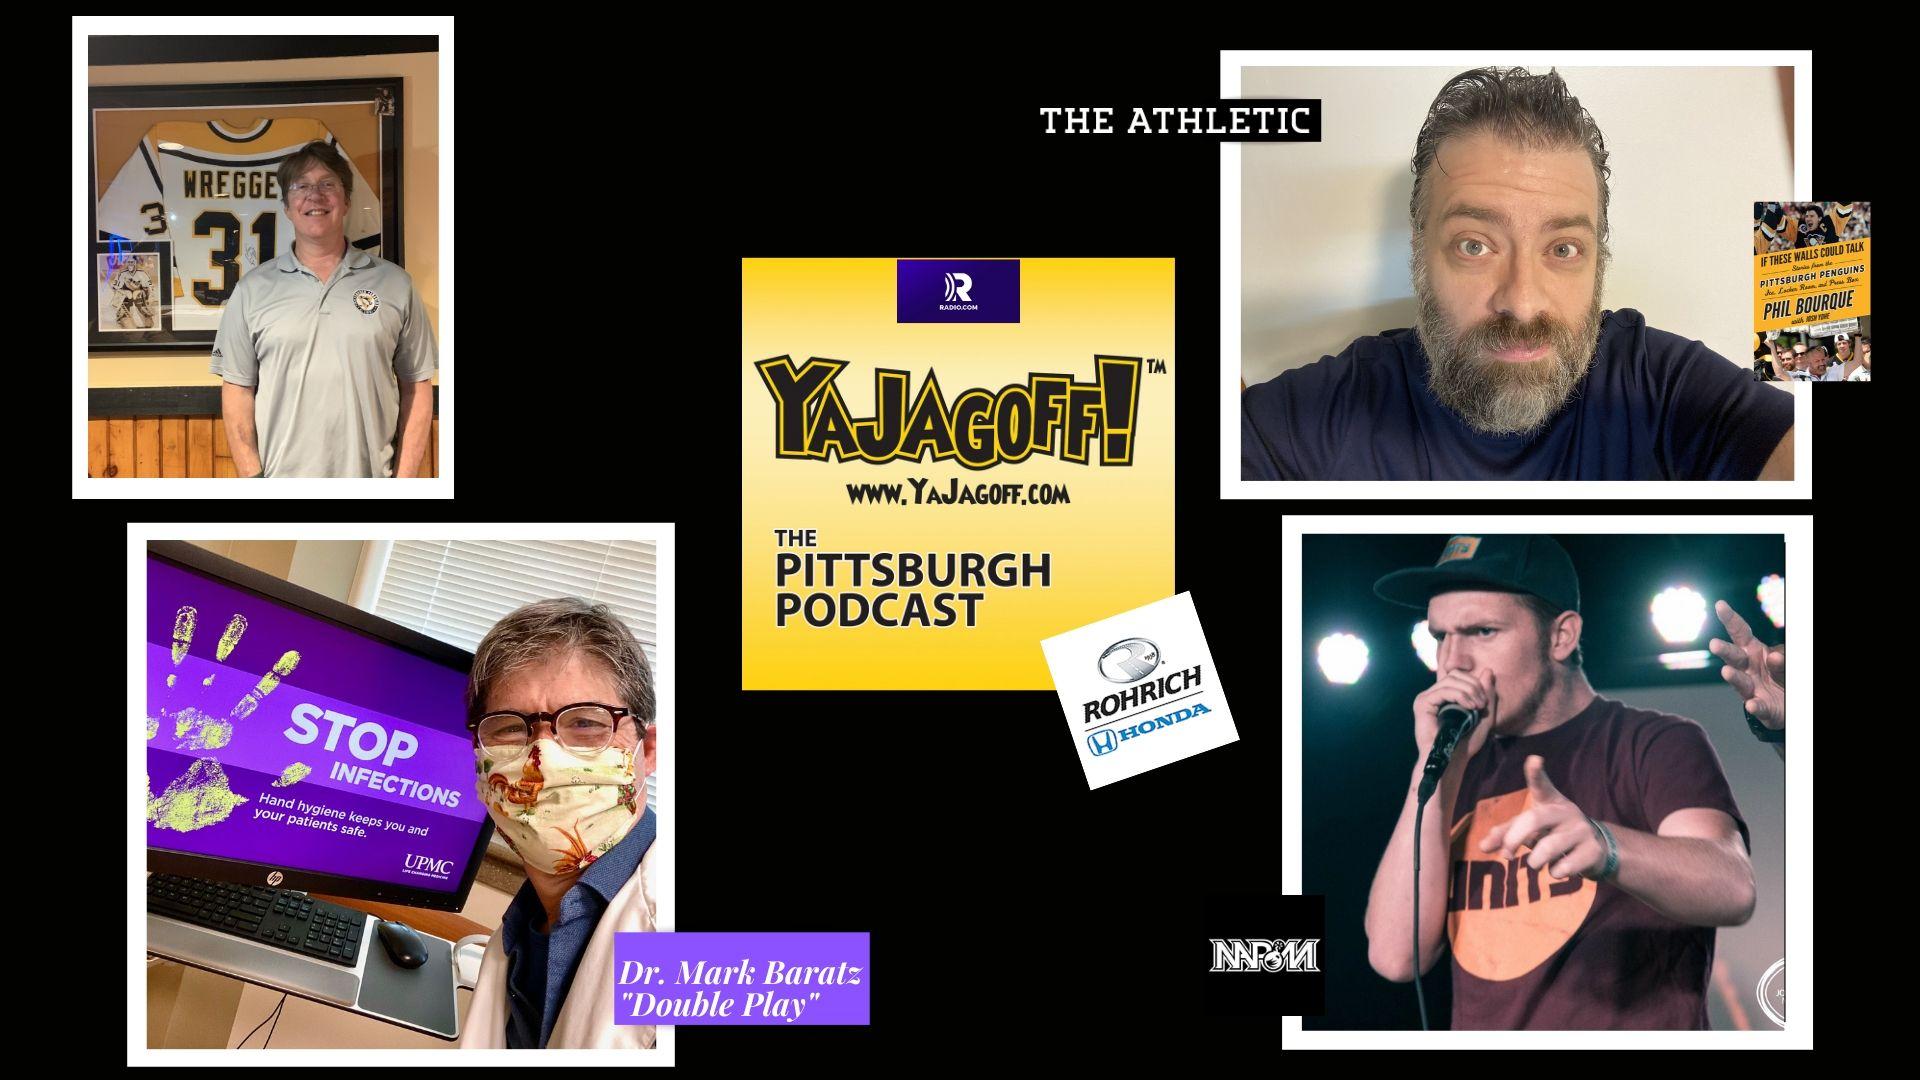 YaJagoff Podcast With Josh Yohe